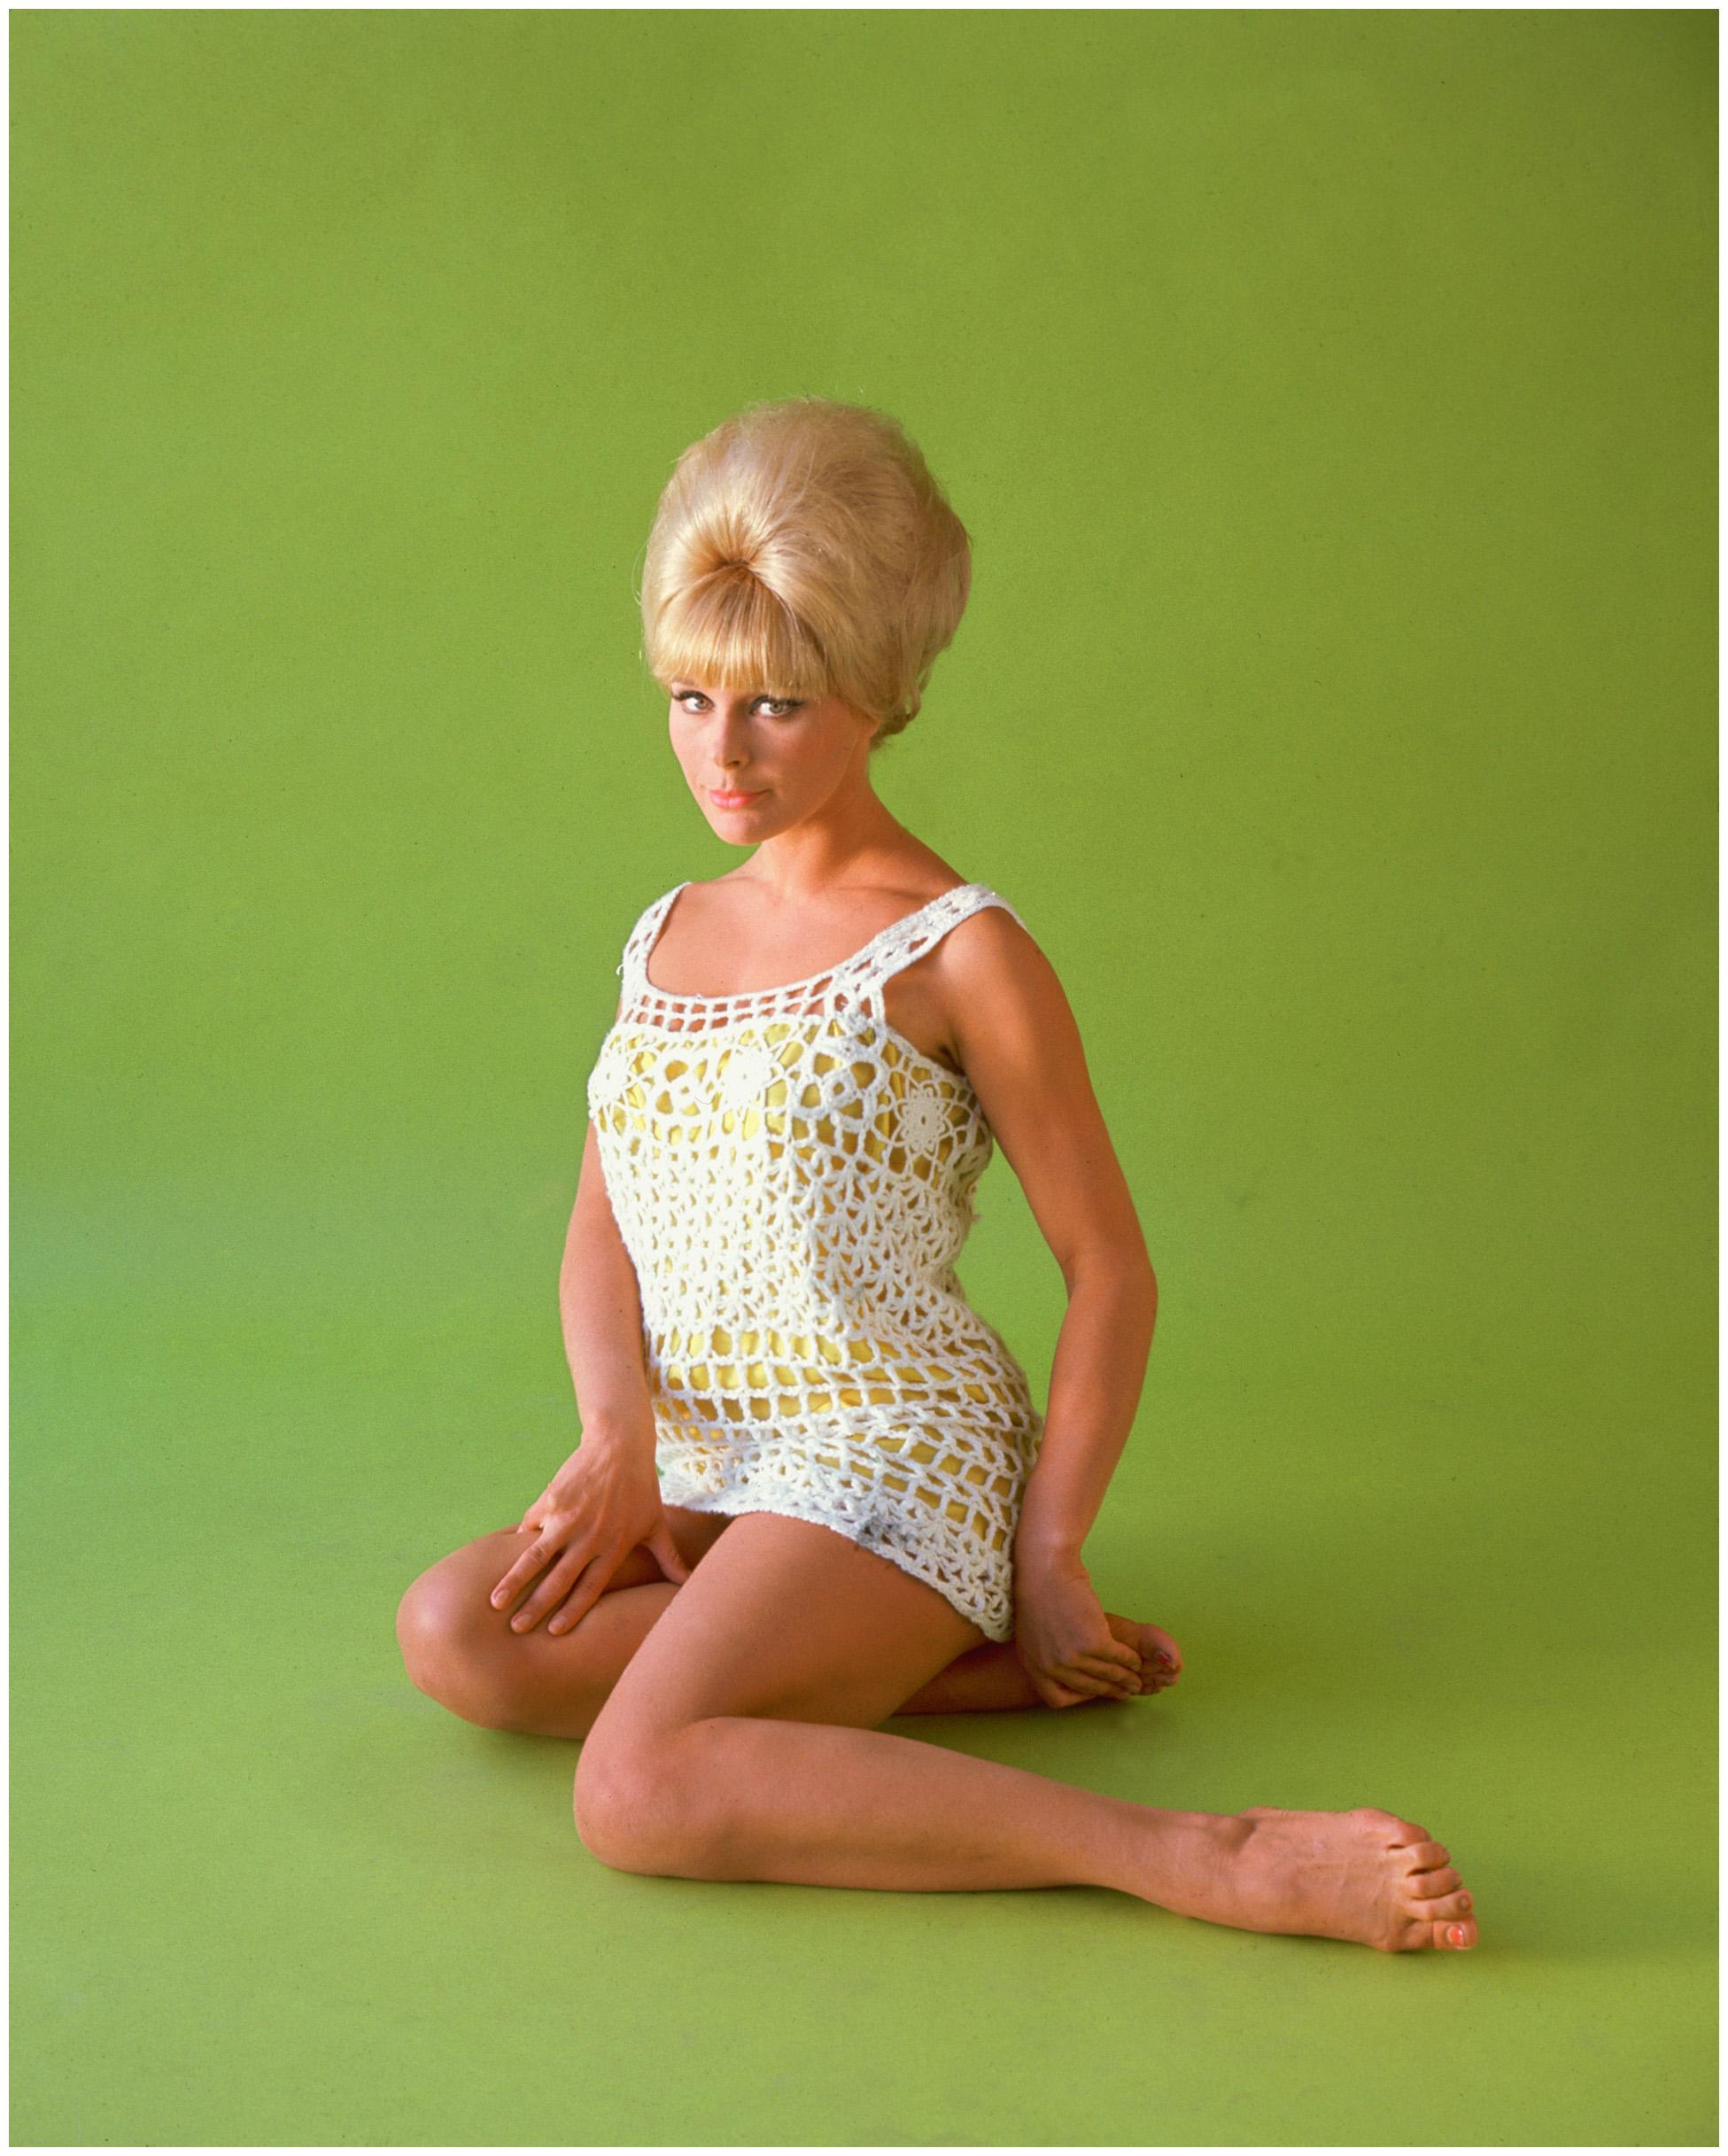 Blonde bombshell 24 femmes per second - Femme blonde photo ...